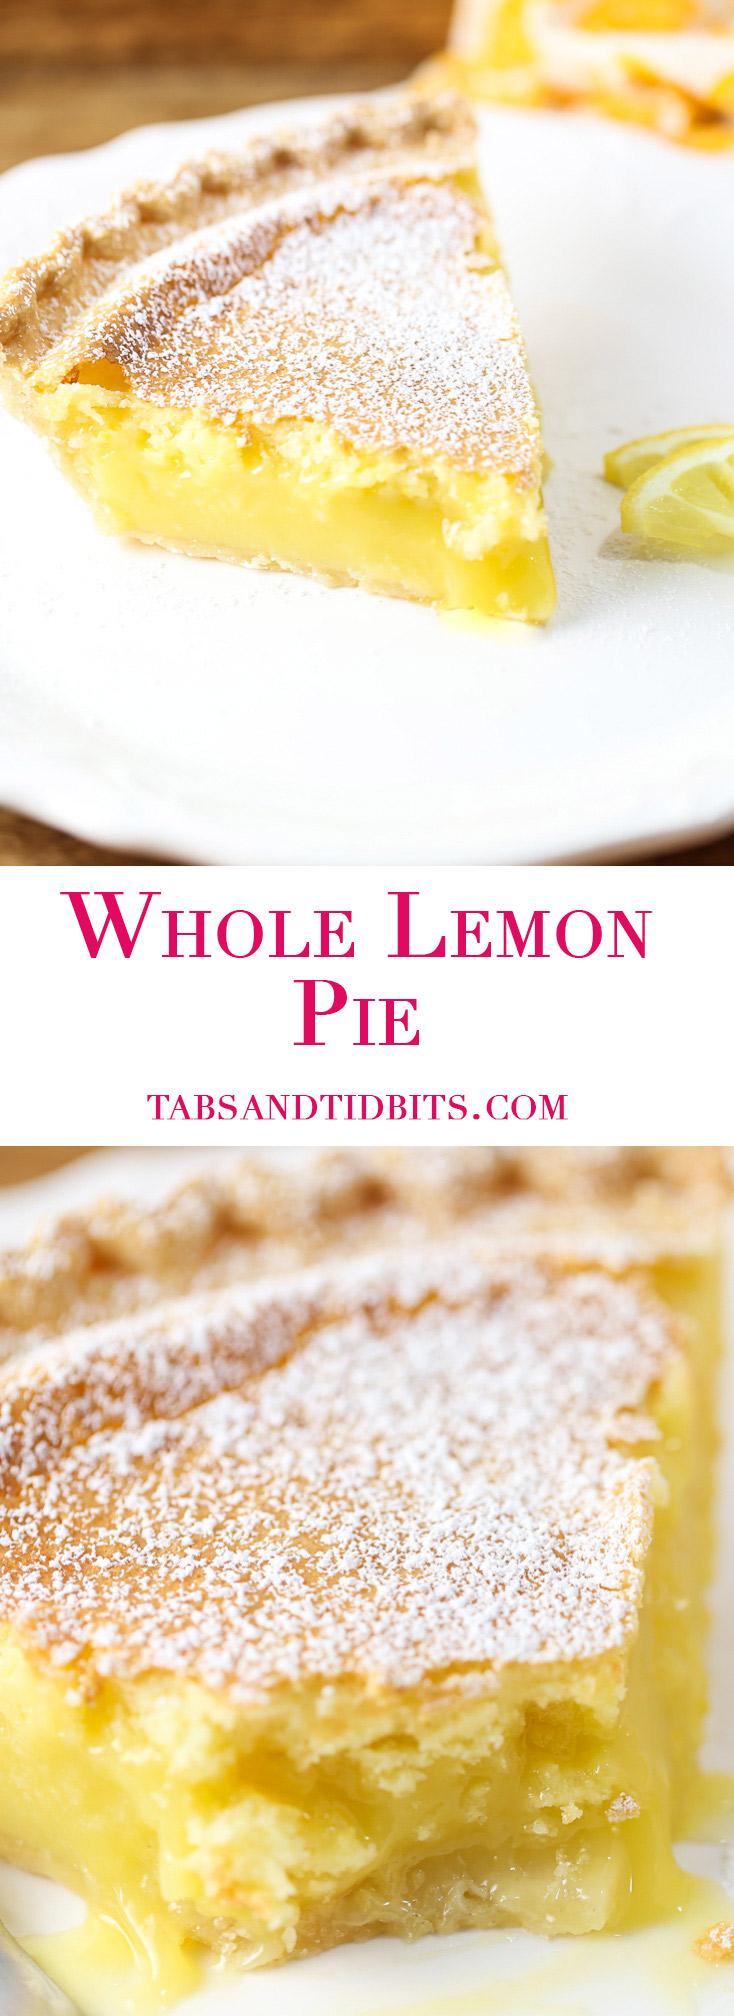 Whole Lemon Pie - A sweet and tart custard-like pie bursting with lemon flavor!